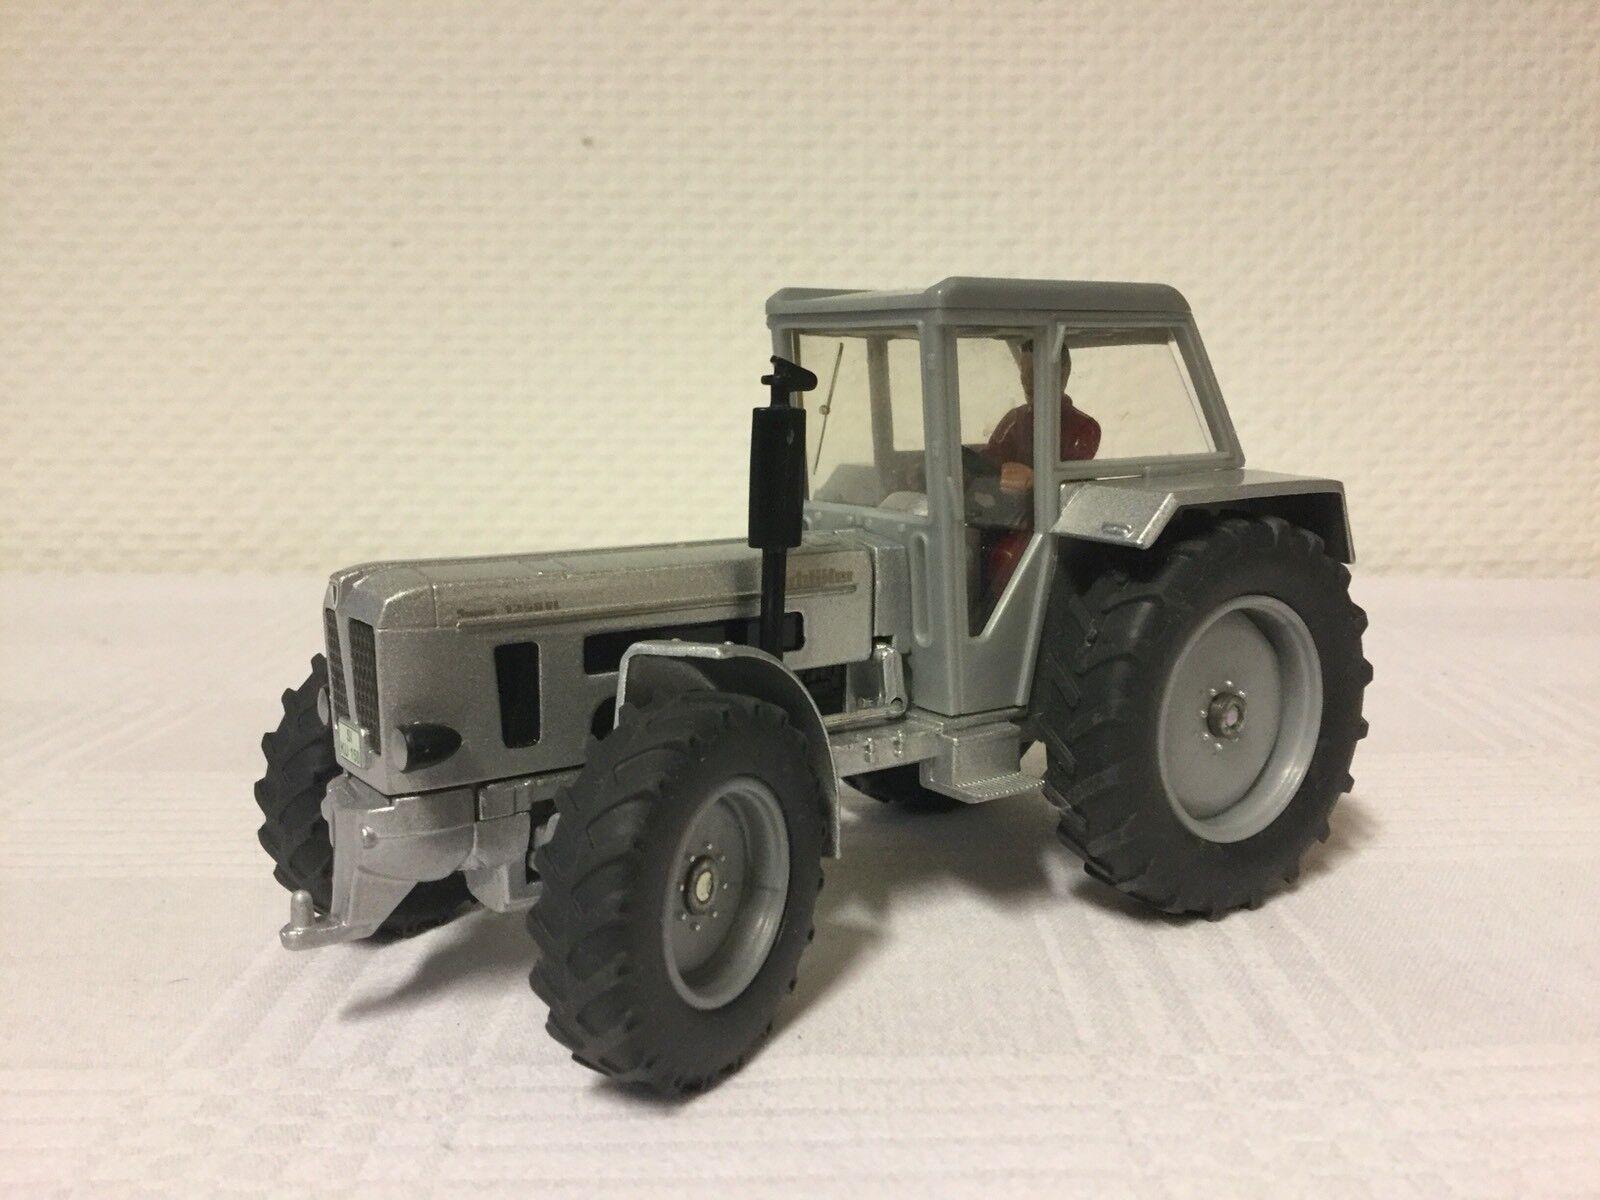 SIKU FARMER Classic 1 32 Schlüter Spécial Modèle Bulldog Tracteur Tracteur eau